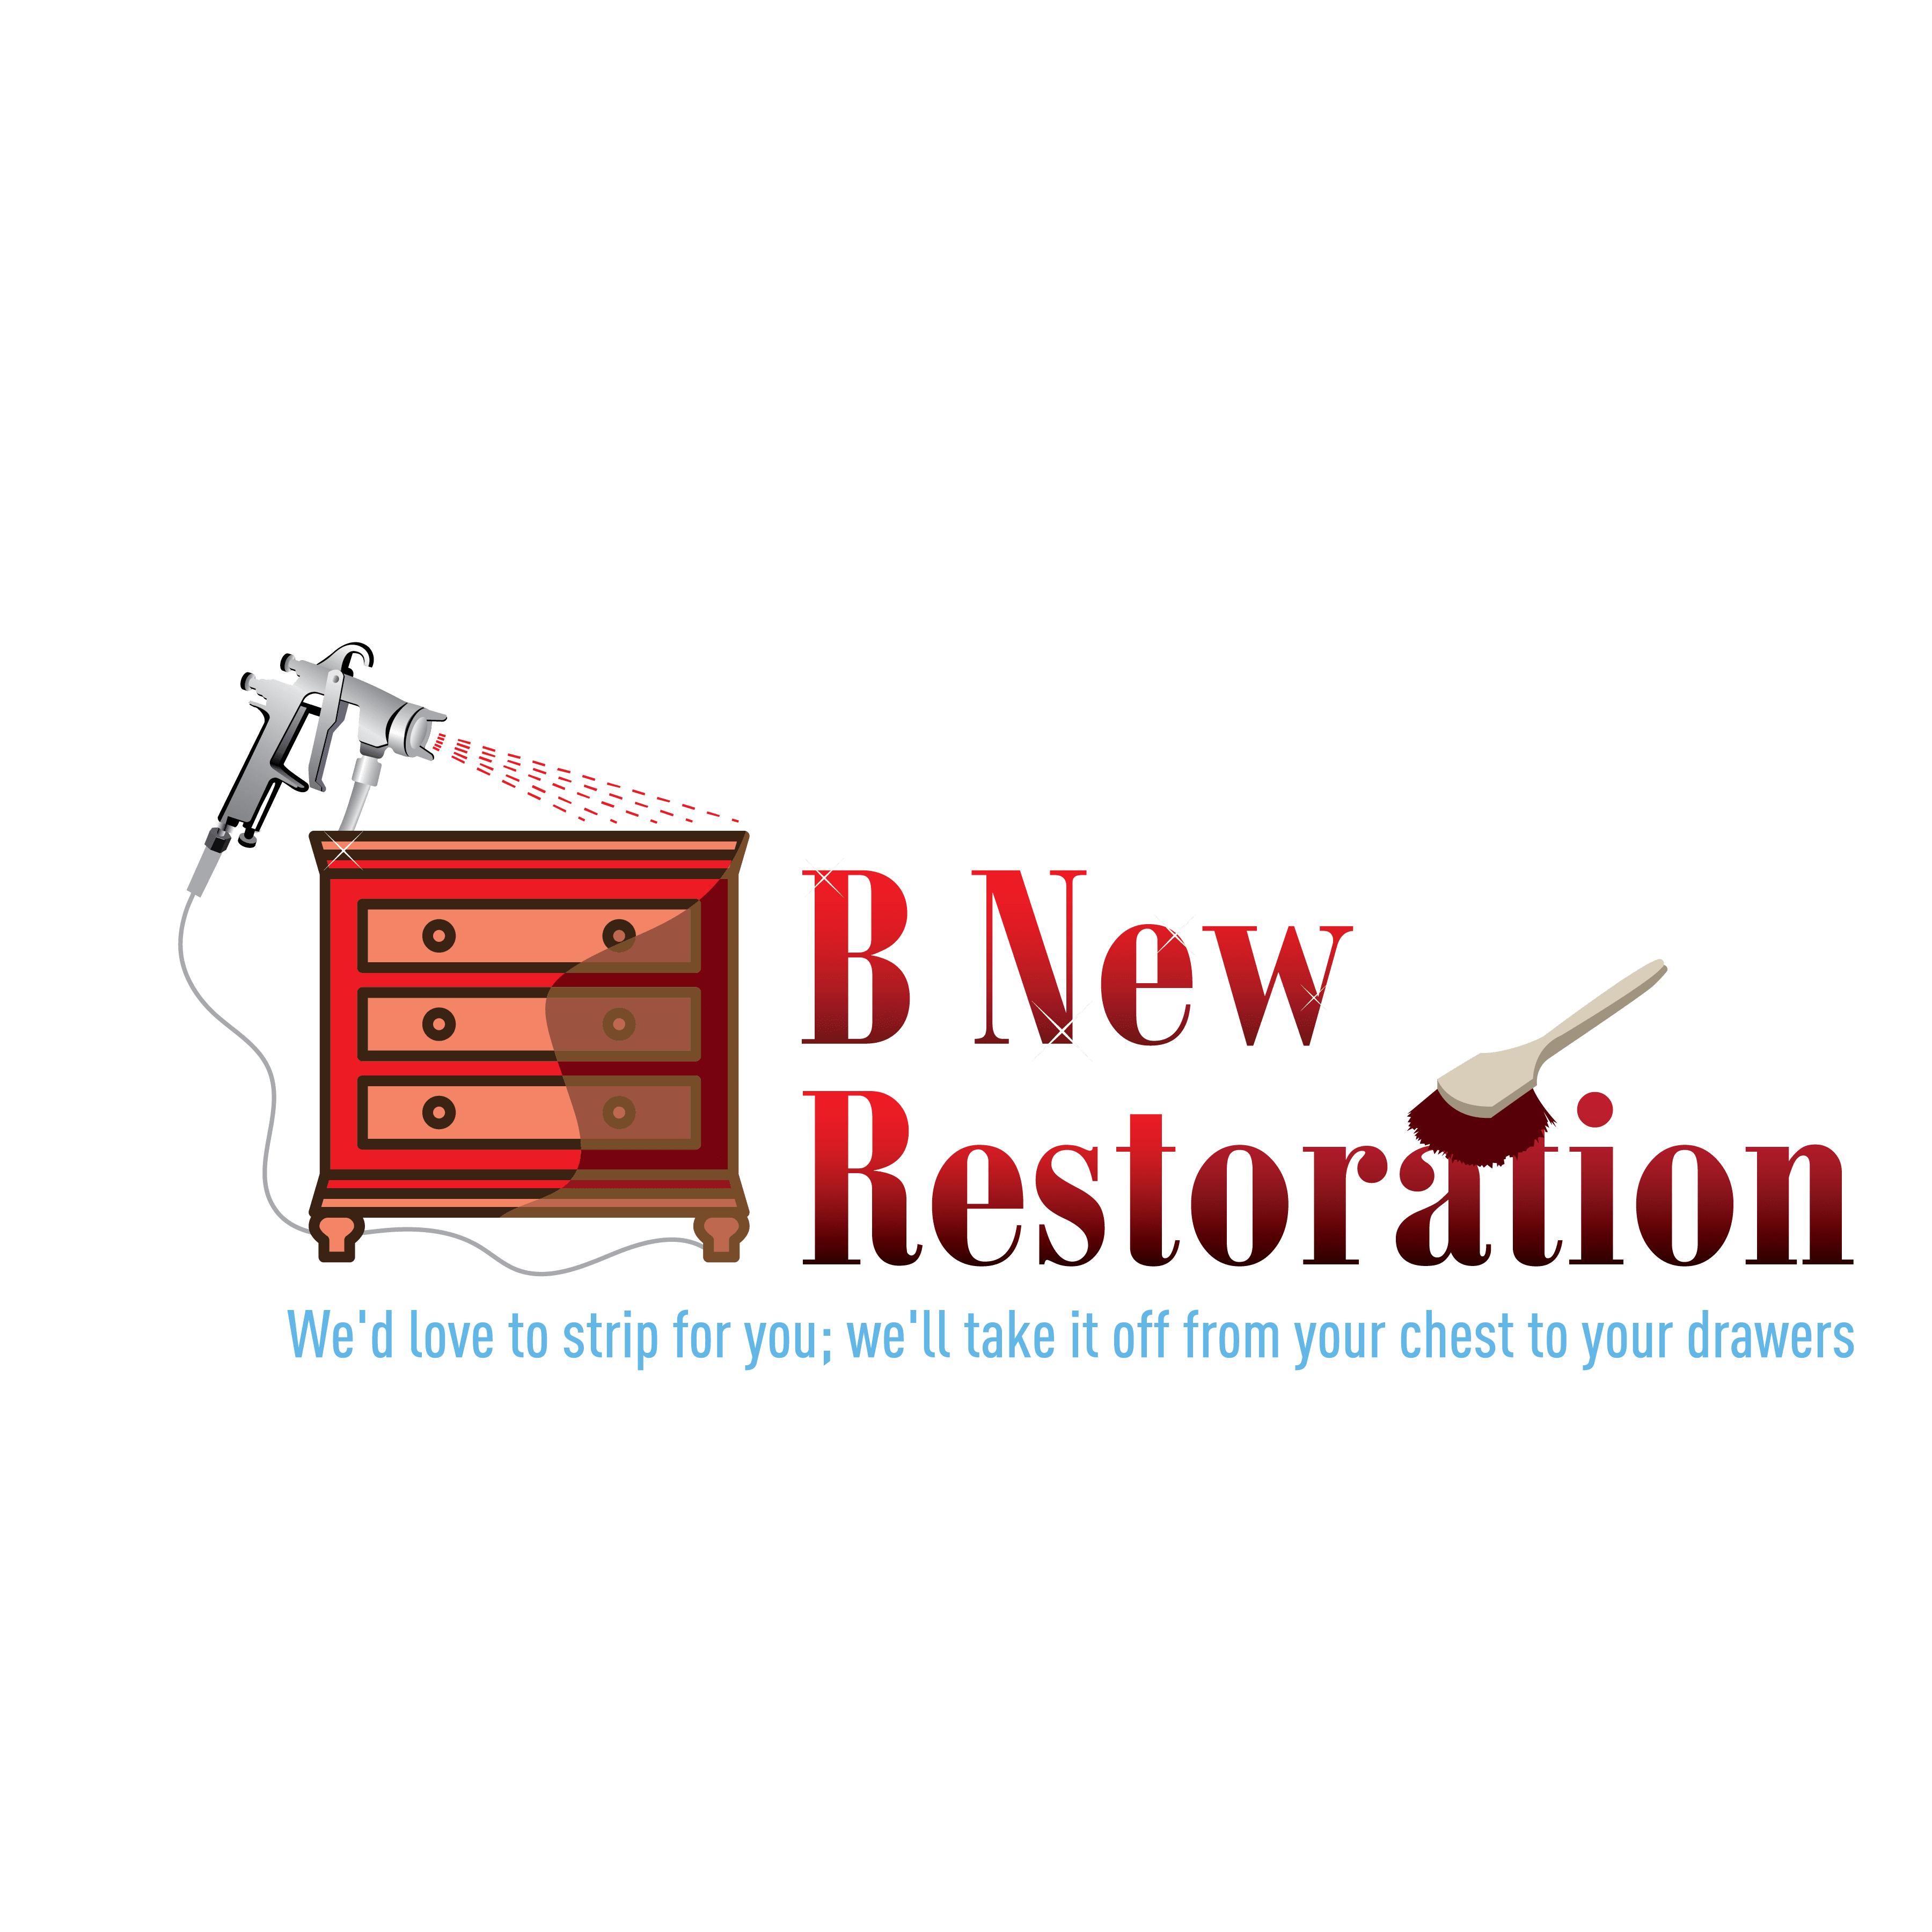 B New Restoration - Benton, AR - Drapery & Upholstery Stores